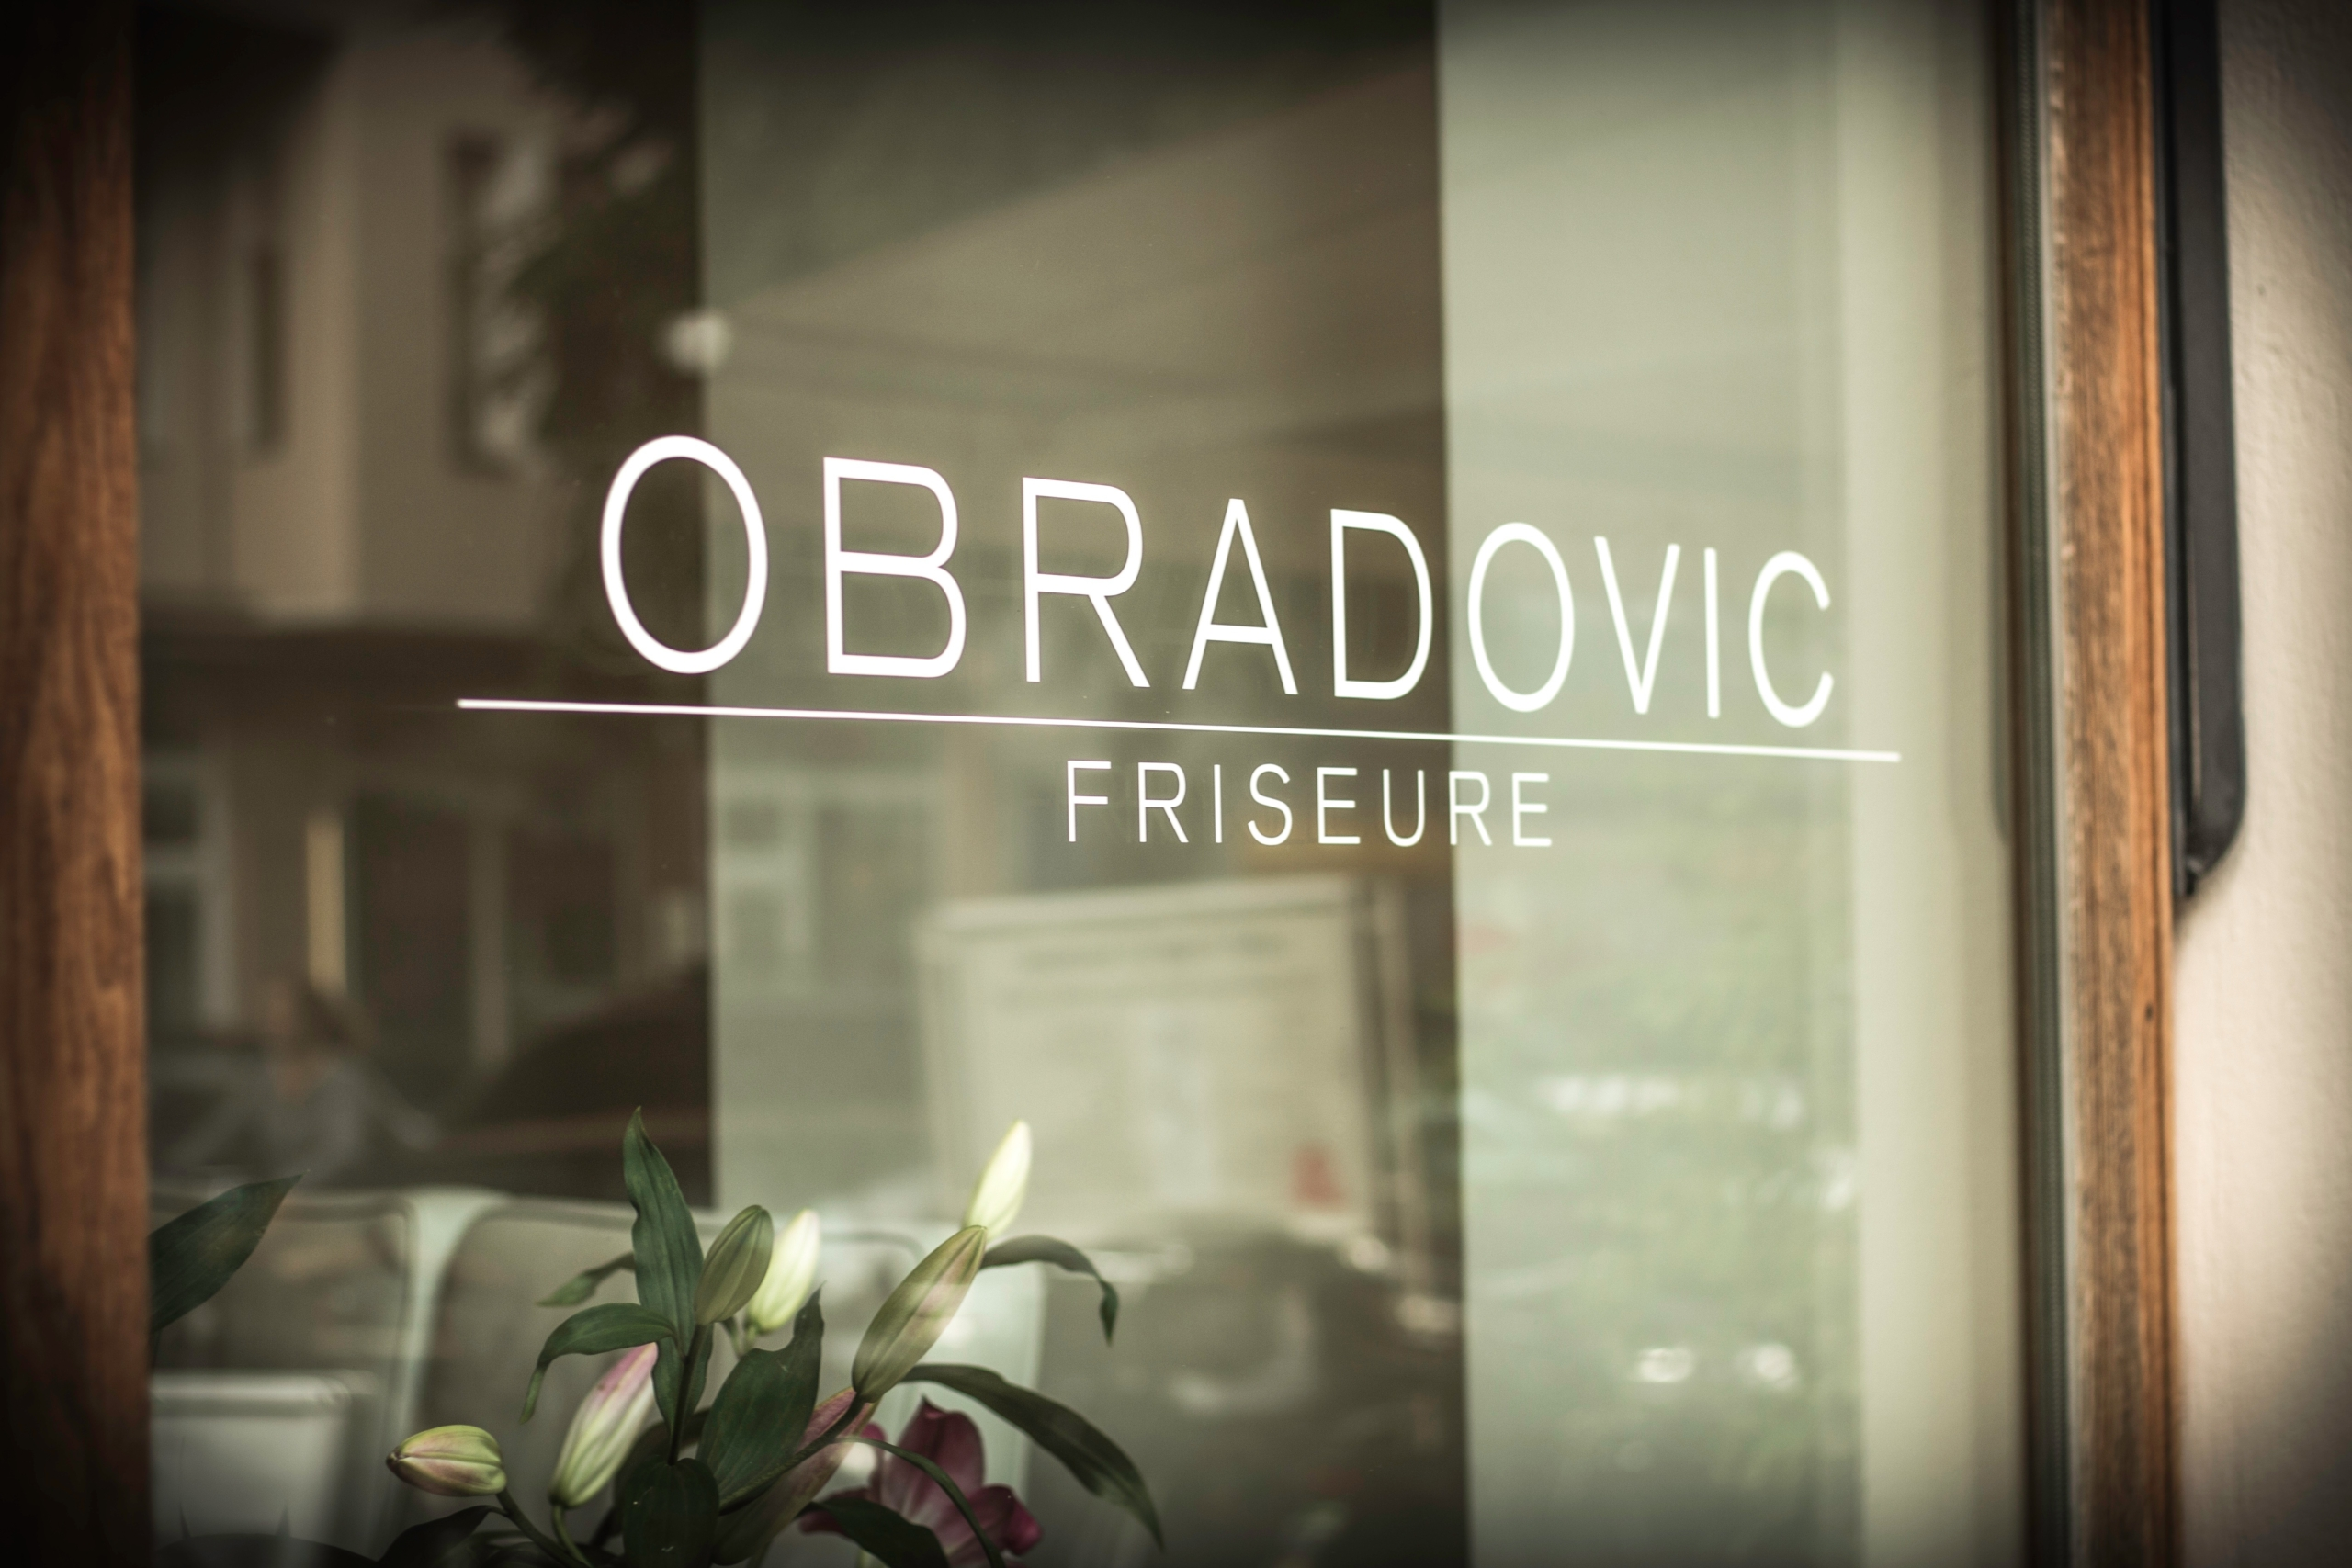 Obradovic Friseure